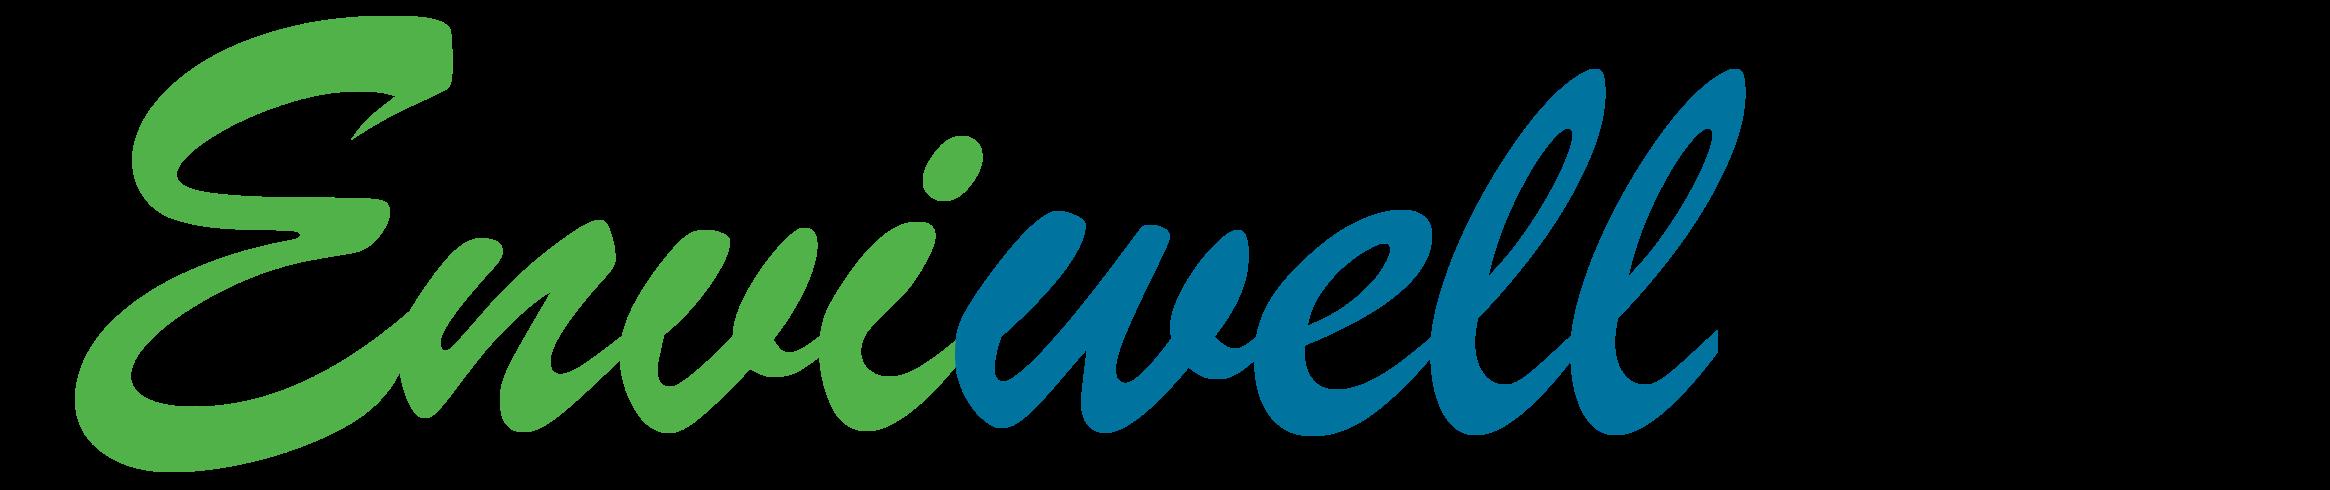 enviwell-logo-originale